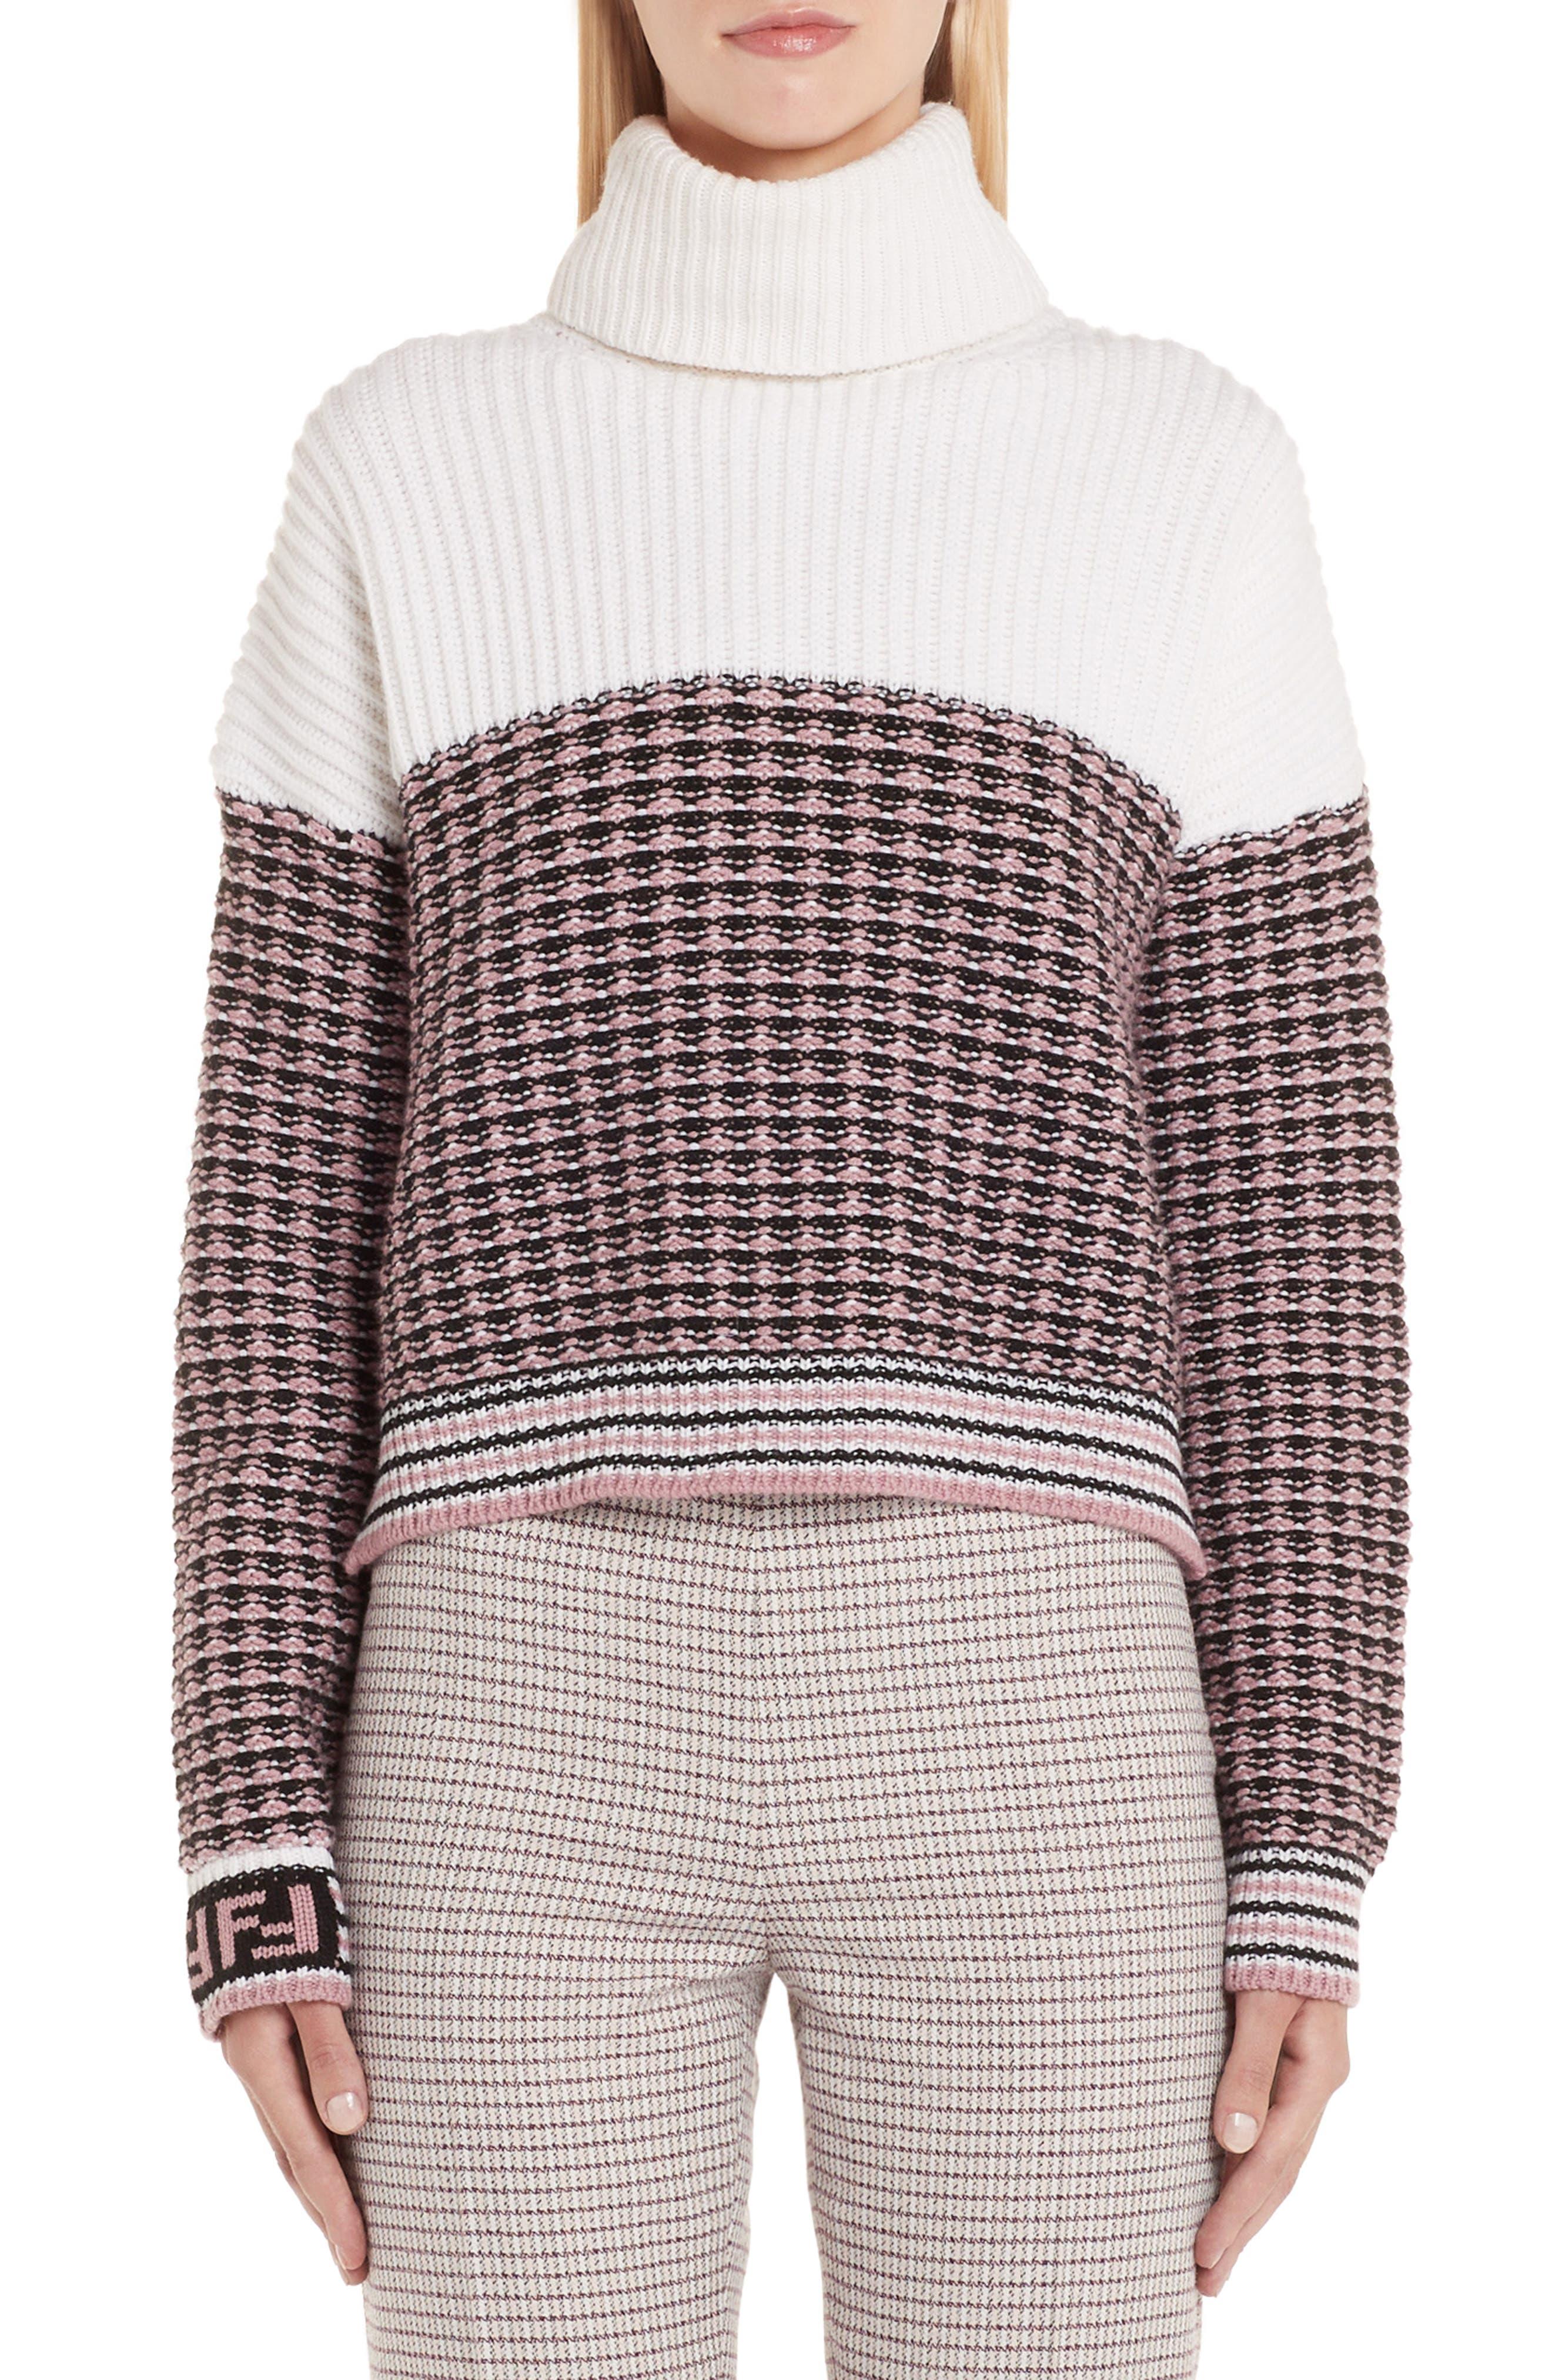 Microcheck Wool & Cashmere Sweater,                             Main thumbnail 1, color,                             ARUBA PINK